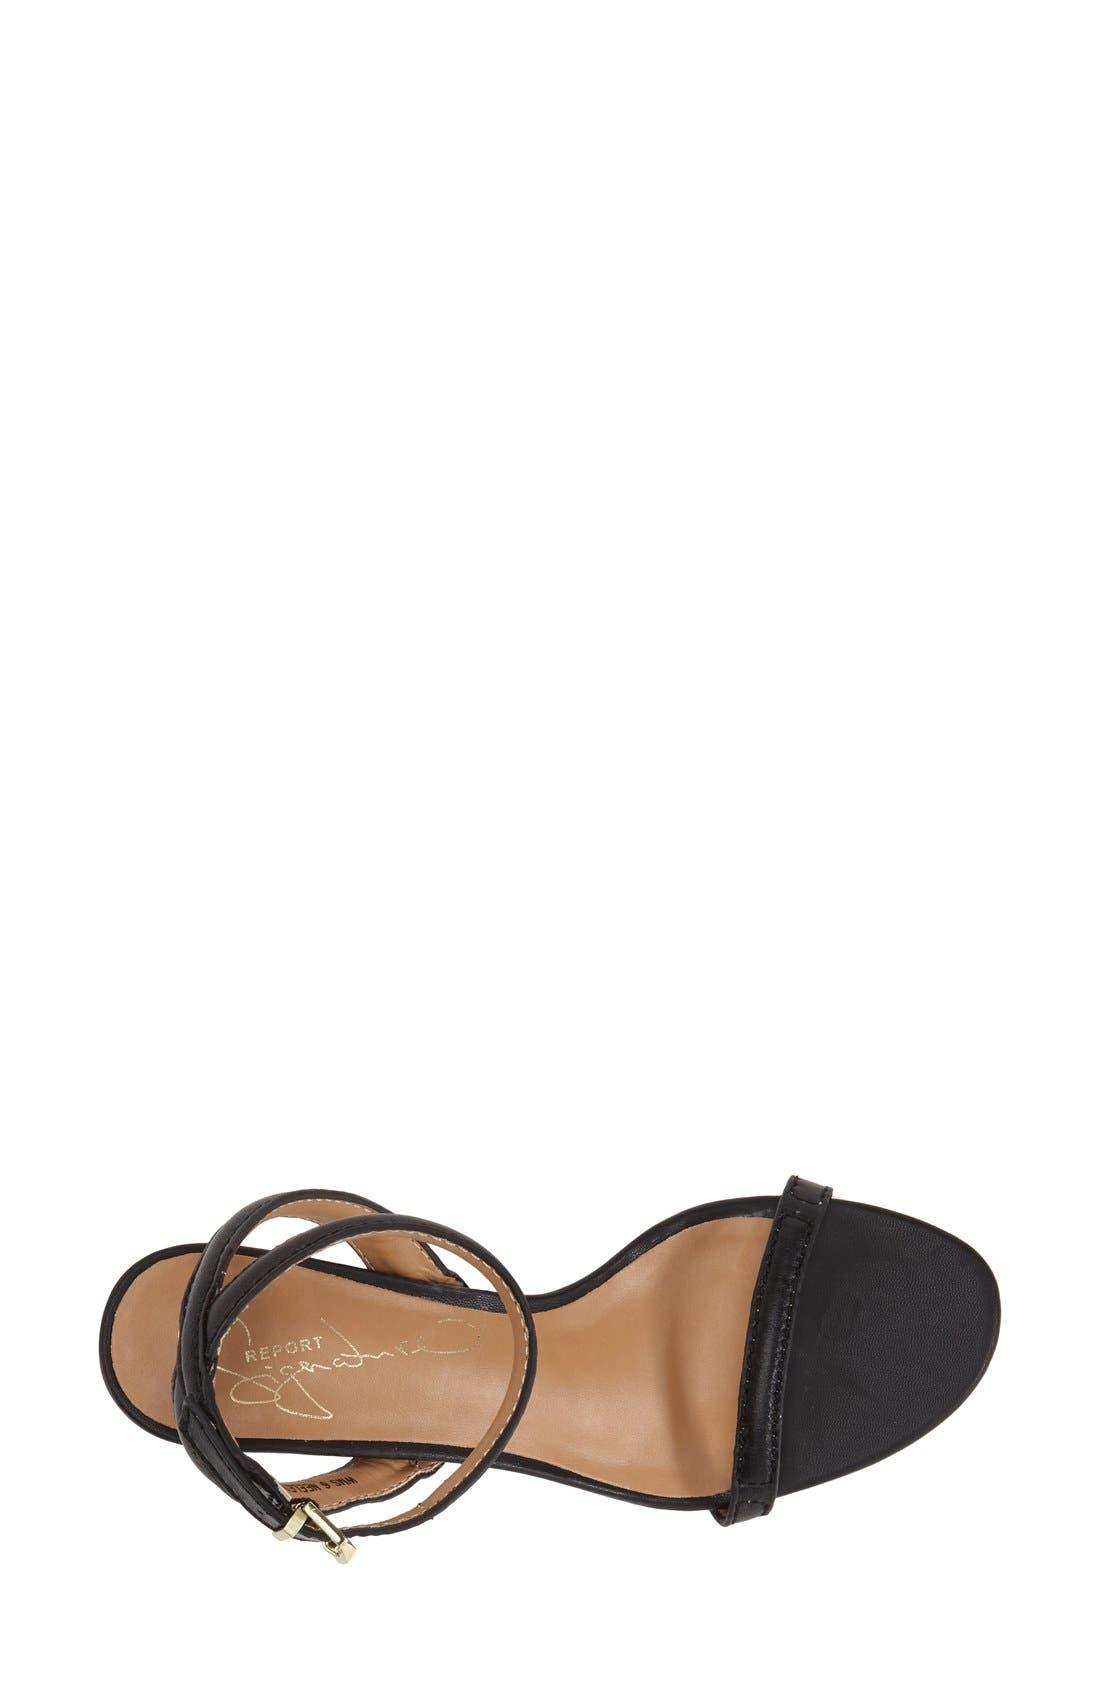 REPORT 'Signature Neely' Ankle Strap Sandal,                             Alternate thumbnail 2, color,                             001